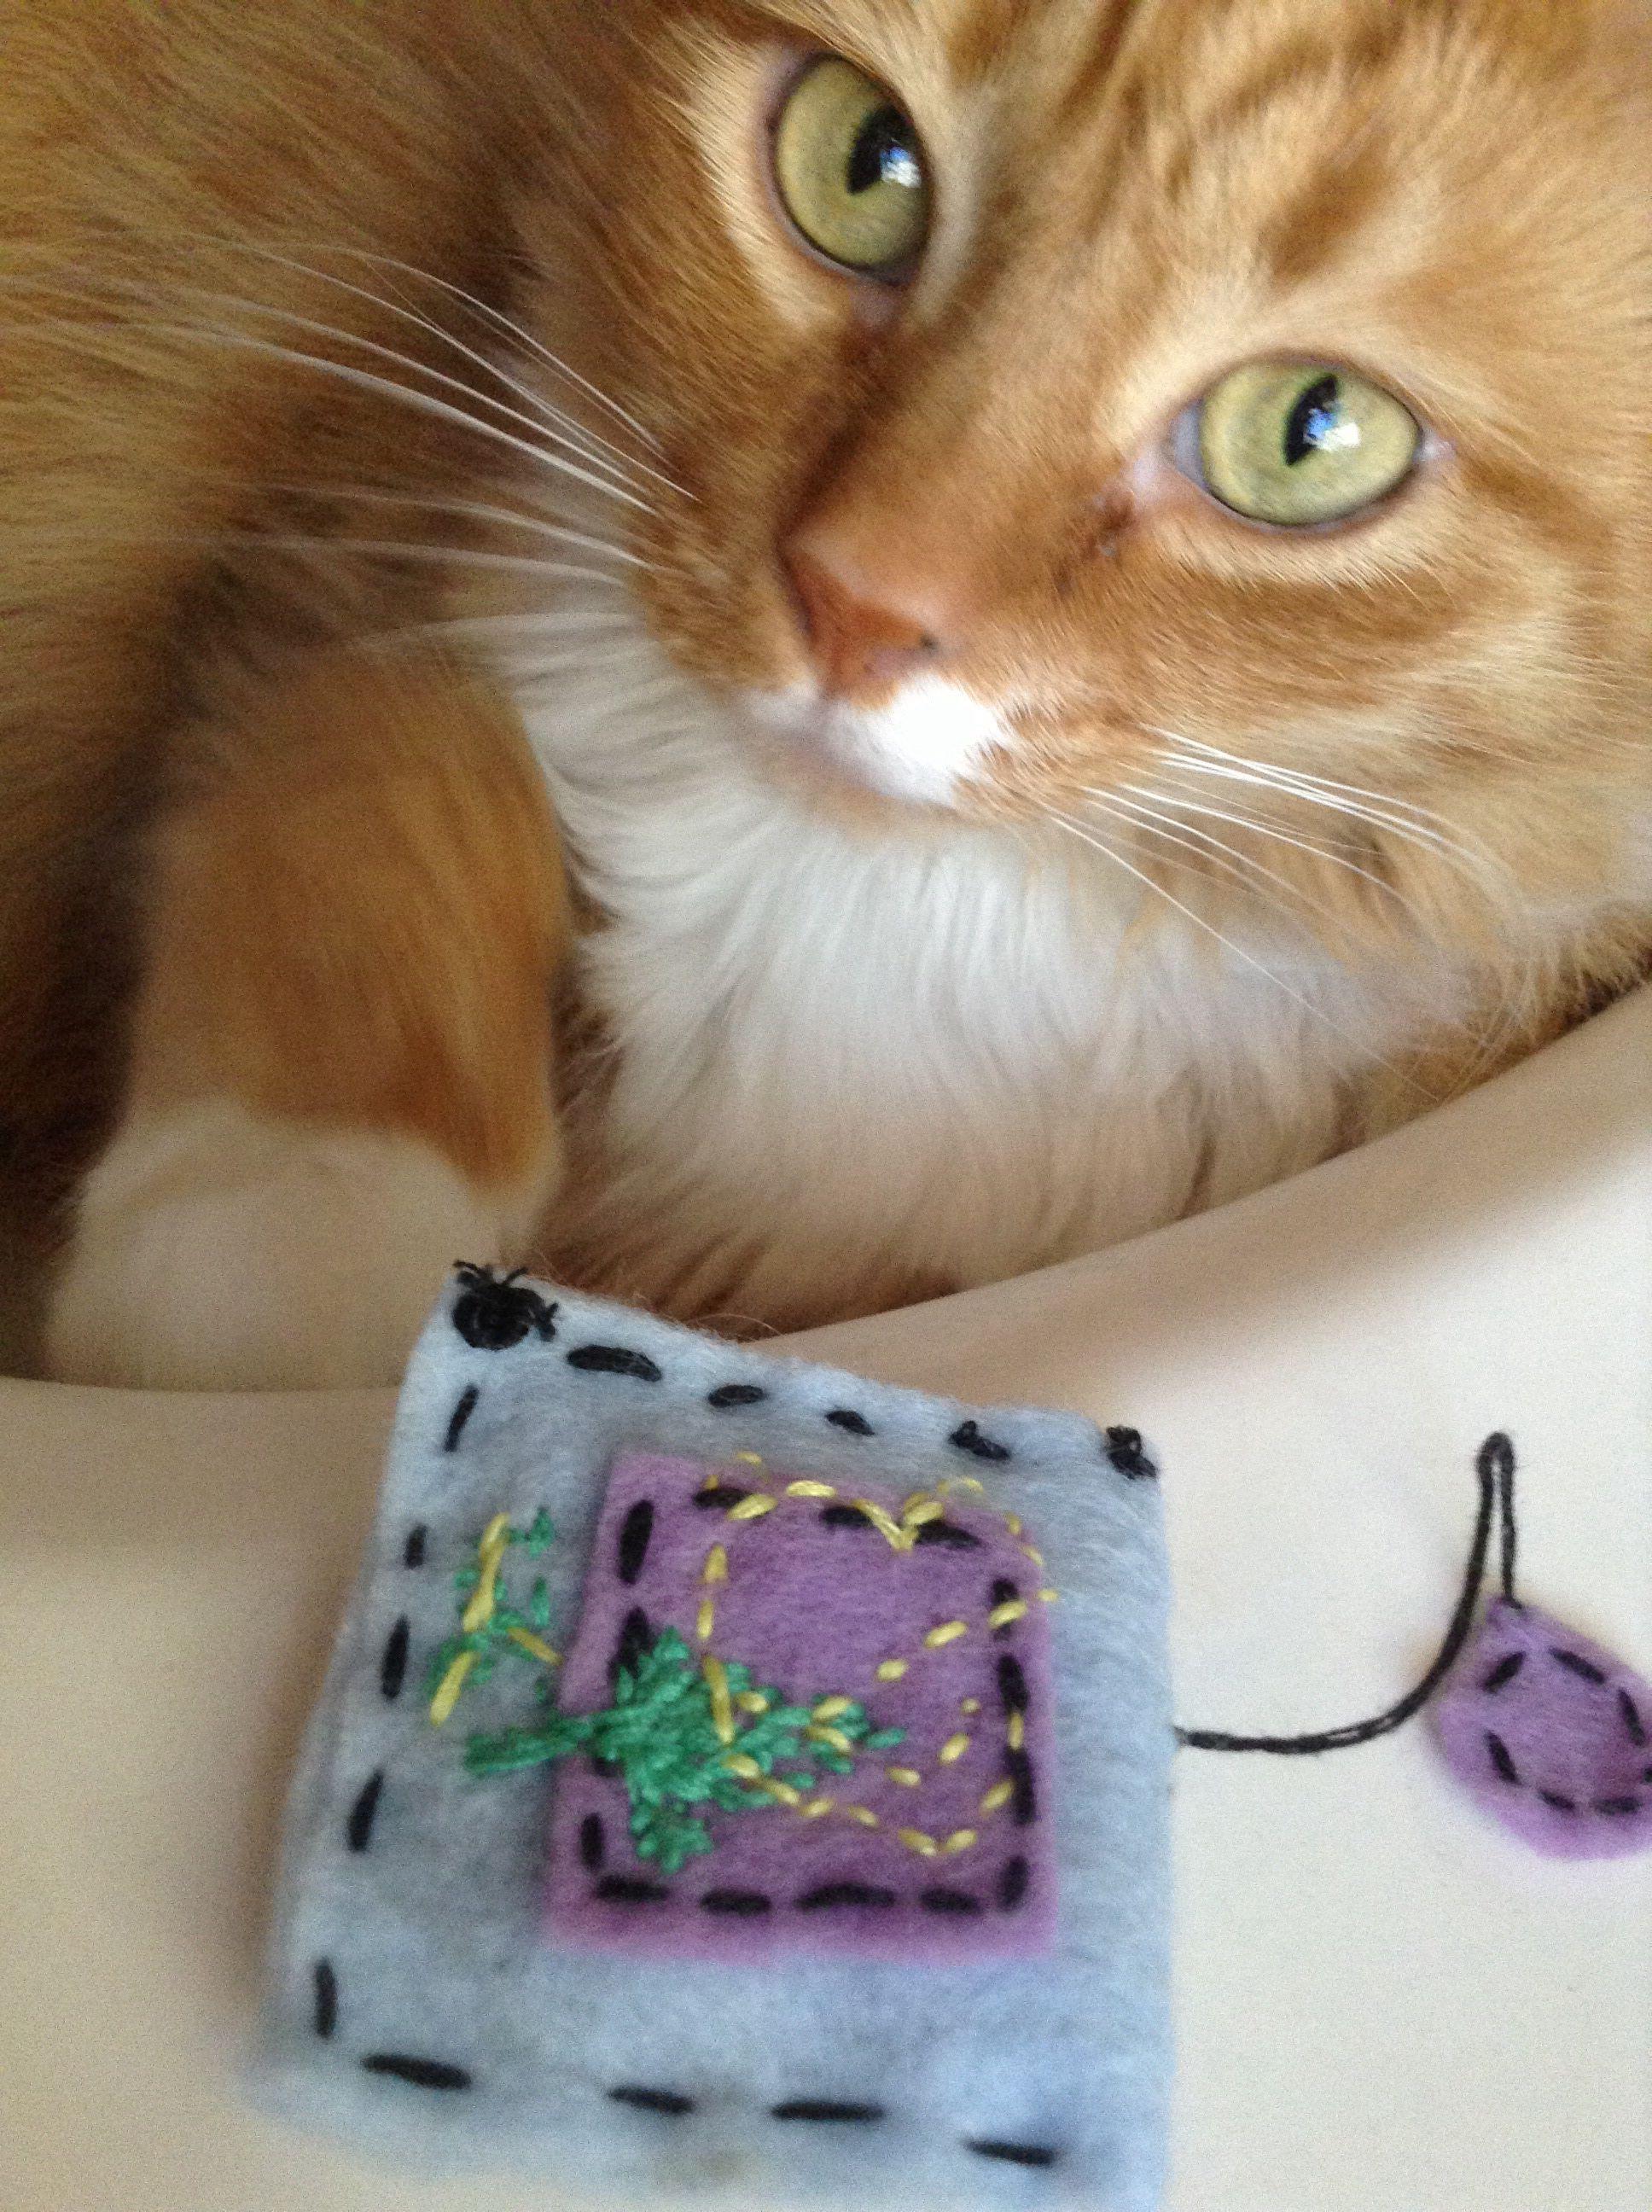 Hand sewn catnip tea bag Cats, Hand sewing, Catnip